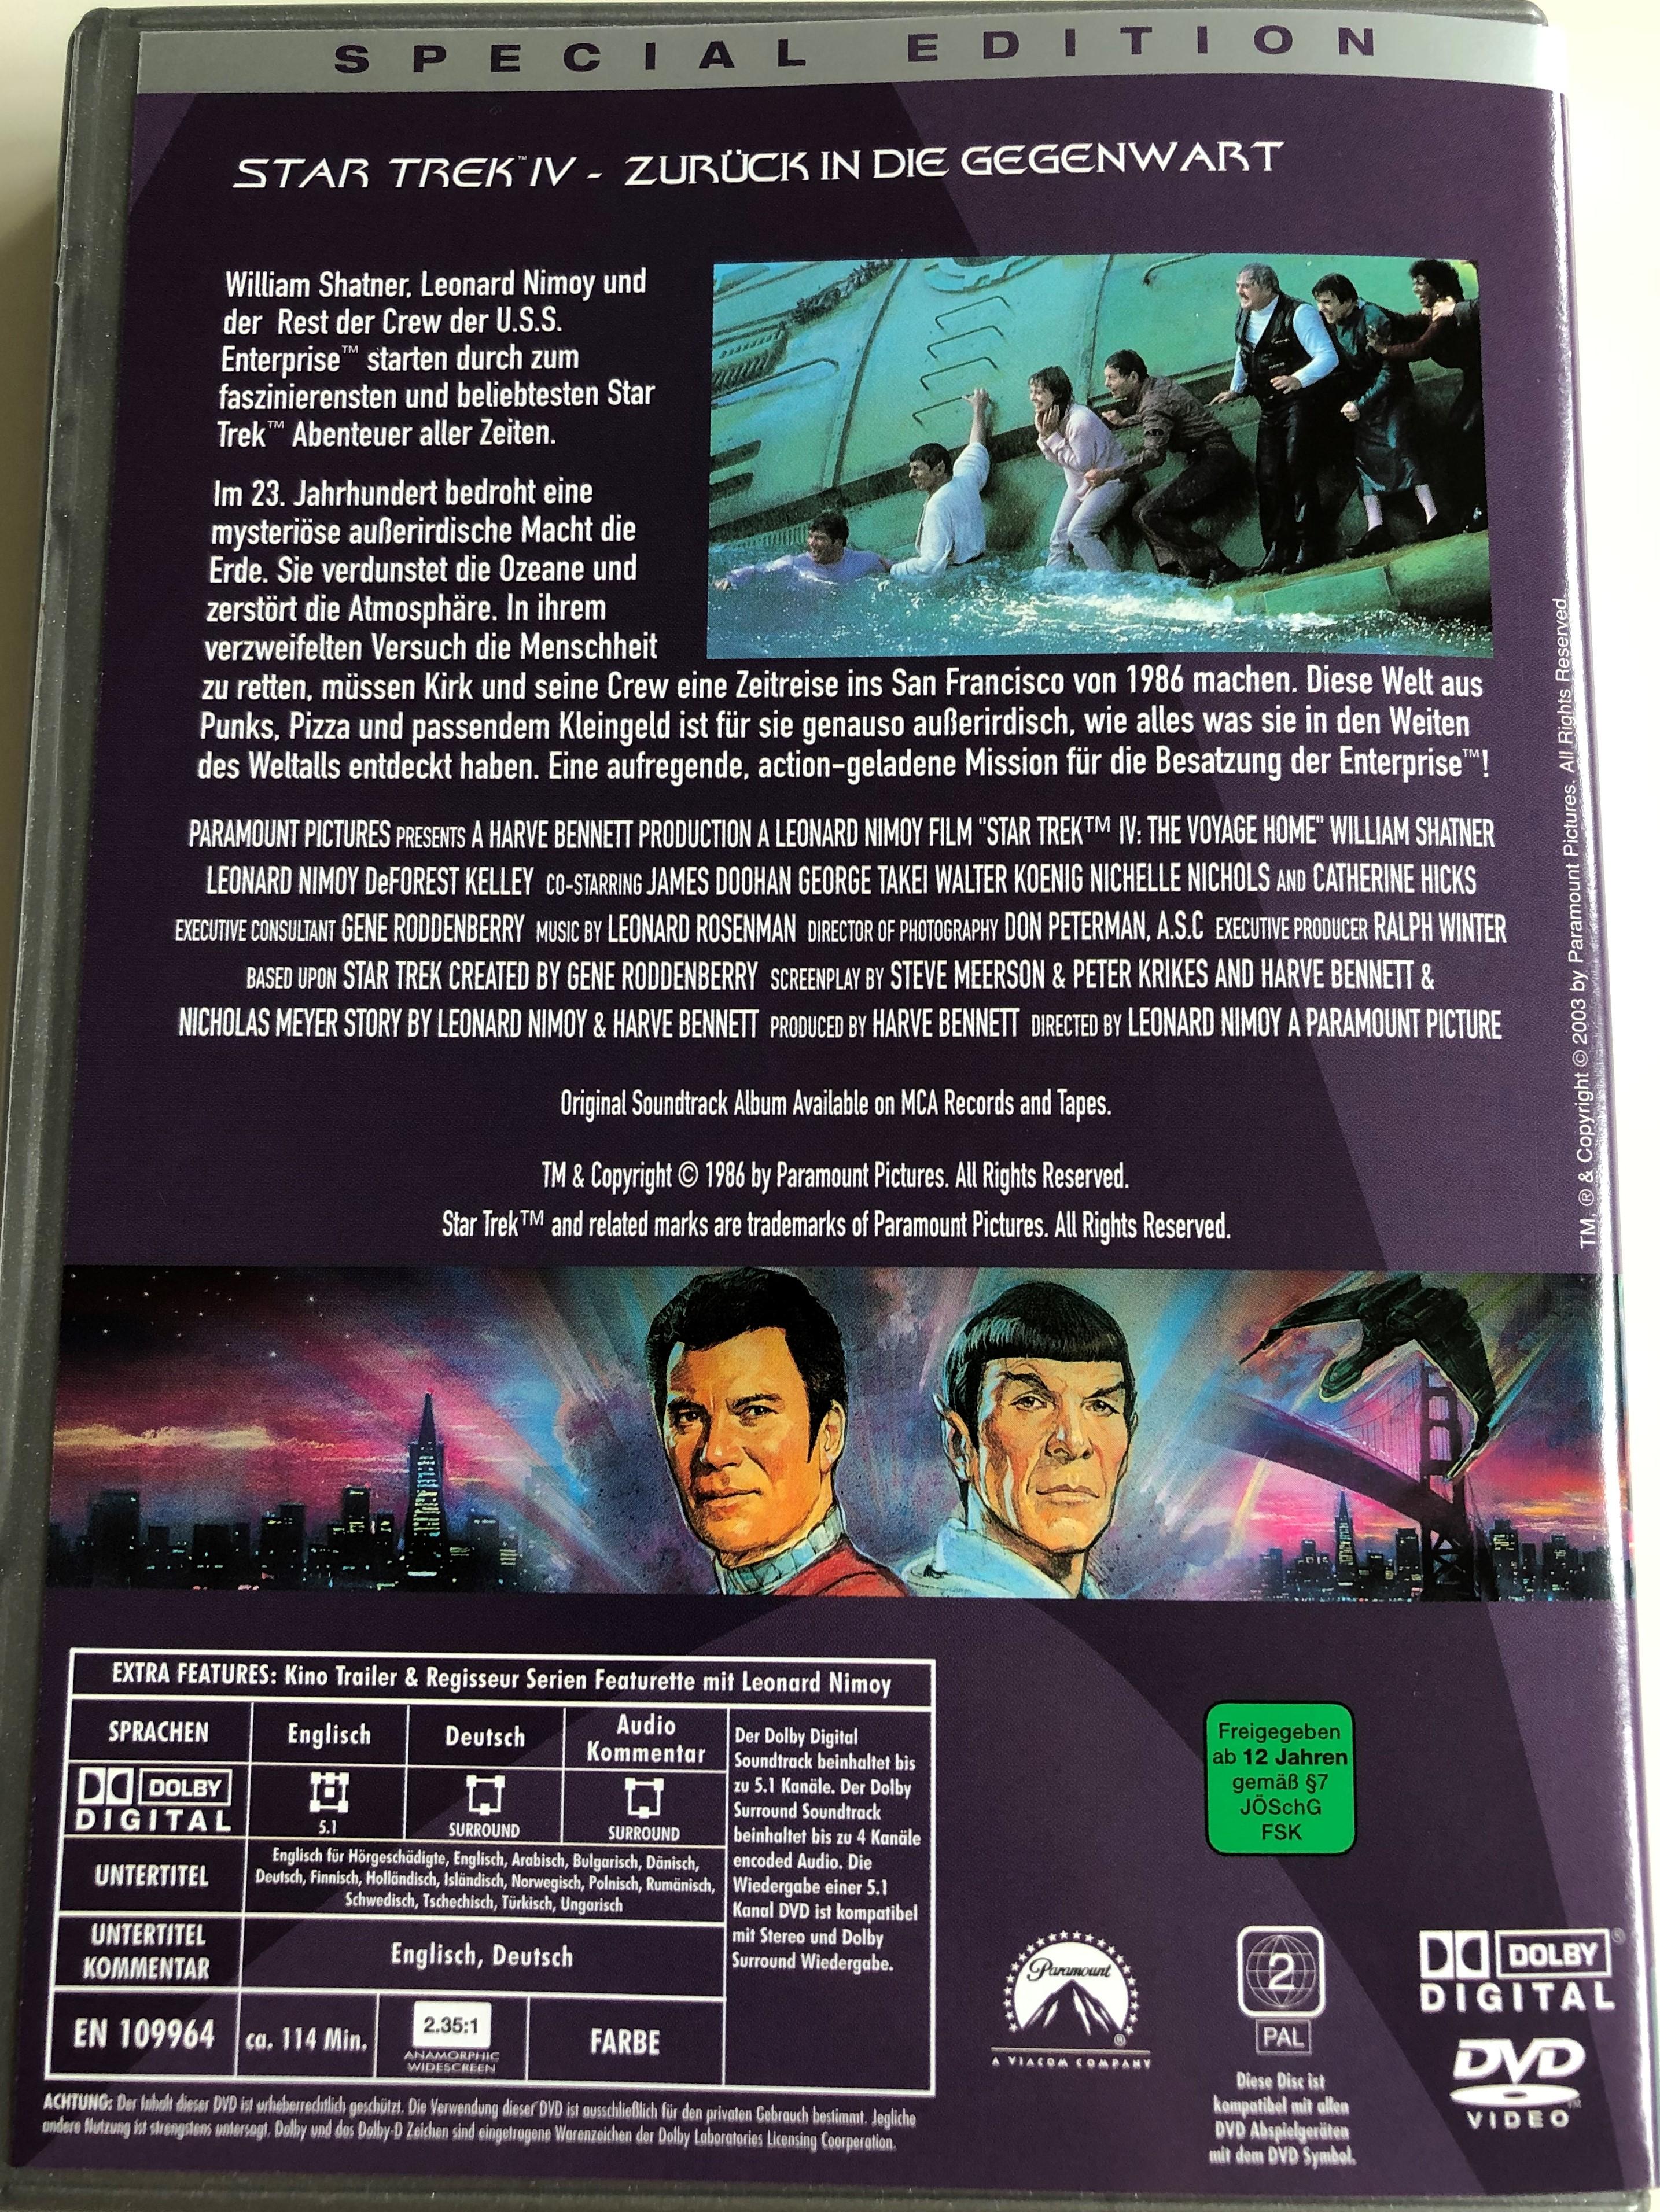 -star-trek-iv-the-voyage-home-special-edition-dvd-1986-star-trek-iv-zur-ck-in-die-gegenwart-directed-by-leonard-nimoy-starring-william-shatner-leonard-nimoy-8-.jpg